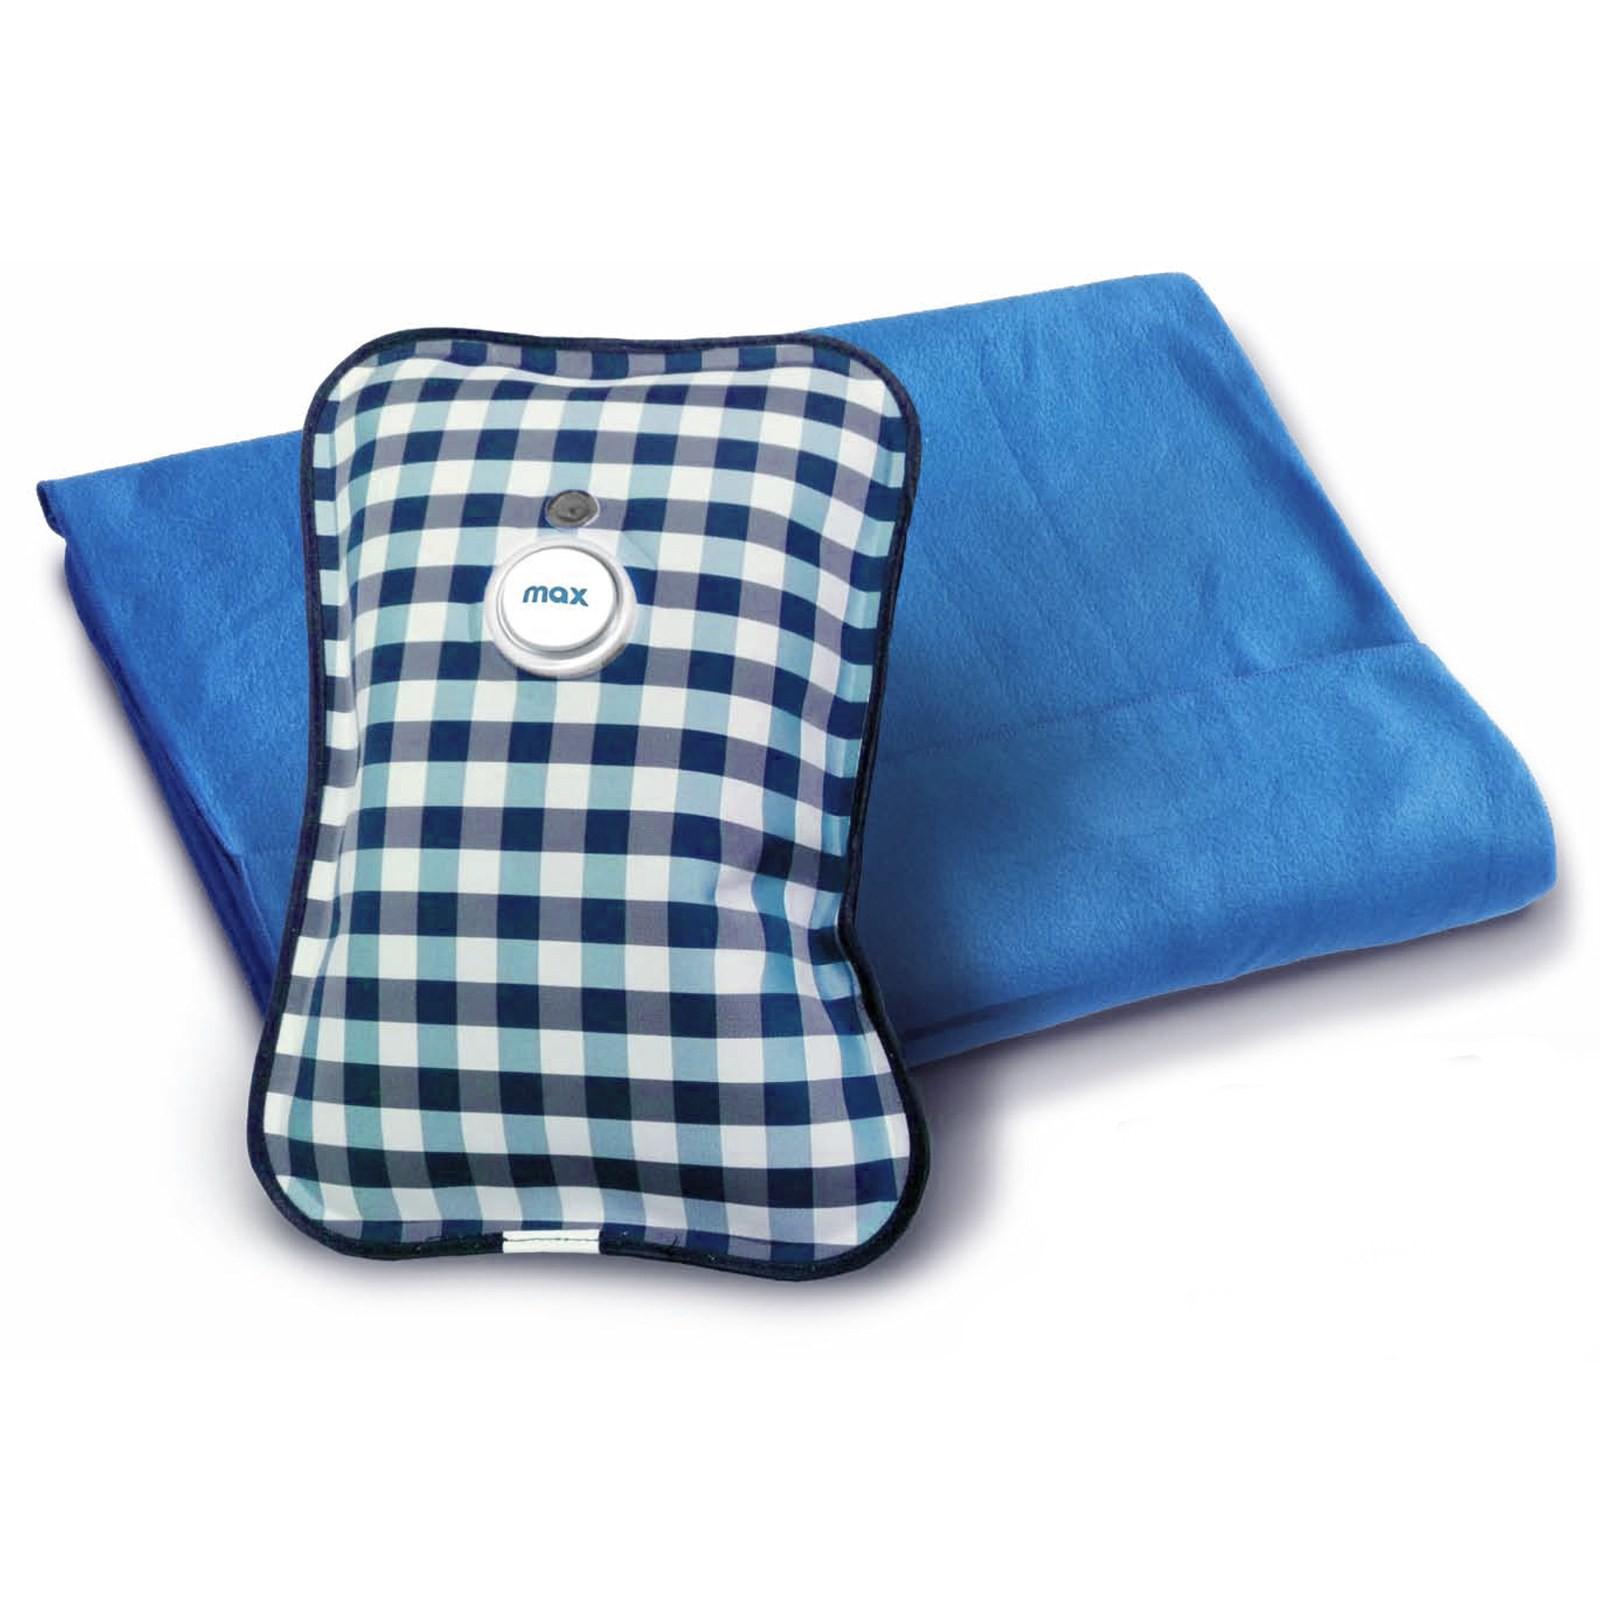 plaid coperta in pile con borsa acqua calda elettrica scalda mani